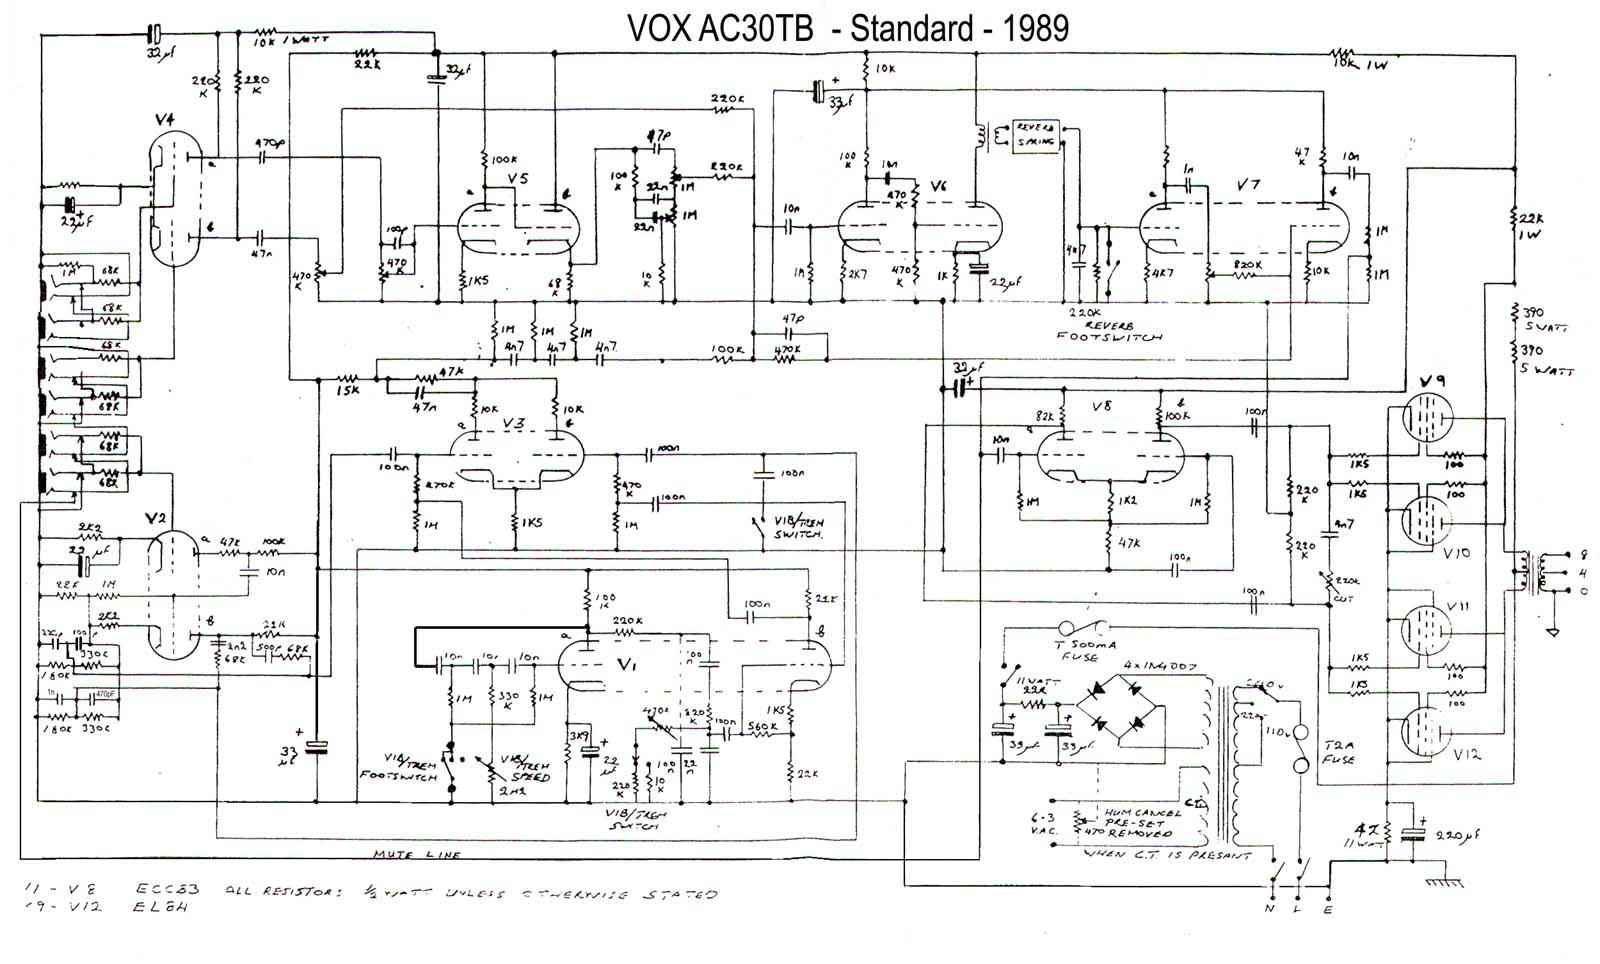 peavey b pickup wiring diagram bz 4758  vintage peavey guitar amplifier schematic free download  vintage peavey guitar amplifier